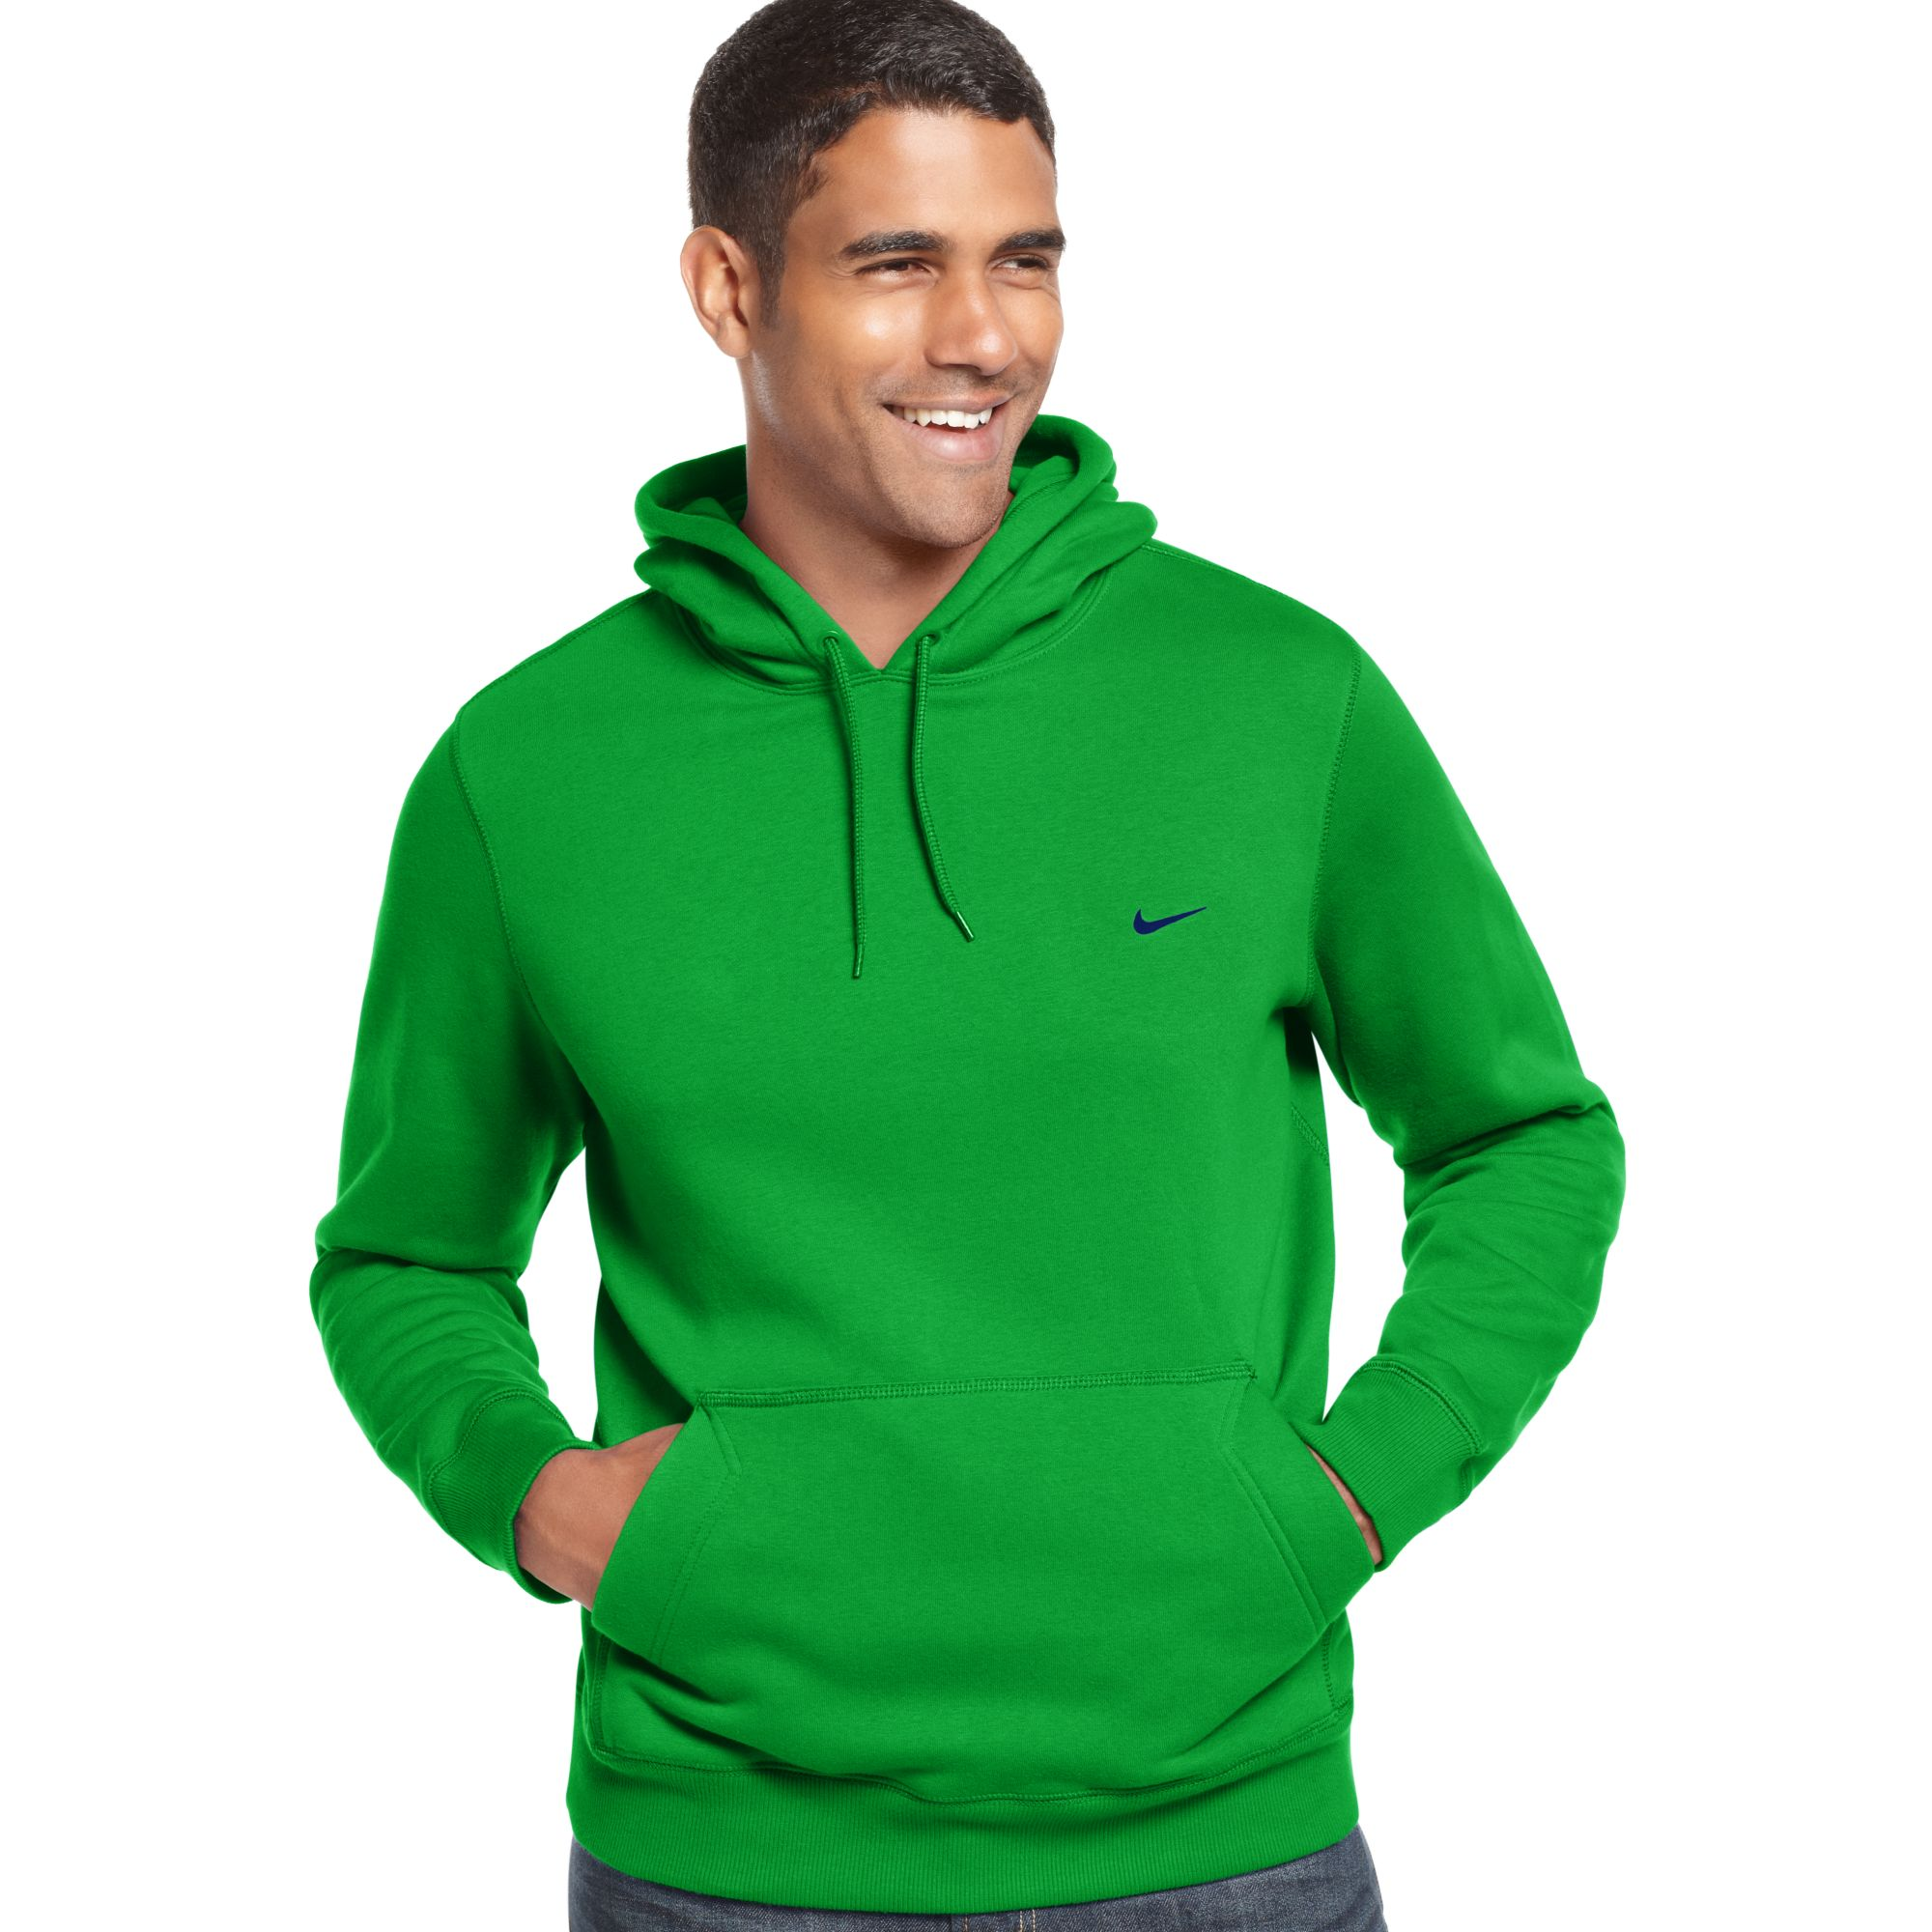 nike classic pullover fleece hoodie in green for men. Black Bedroom Furniture Sets. Home Design Ideas